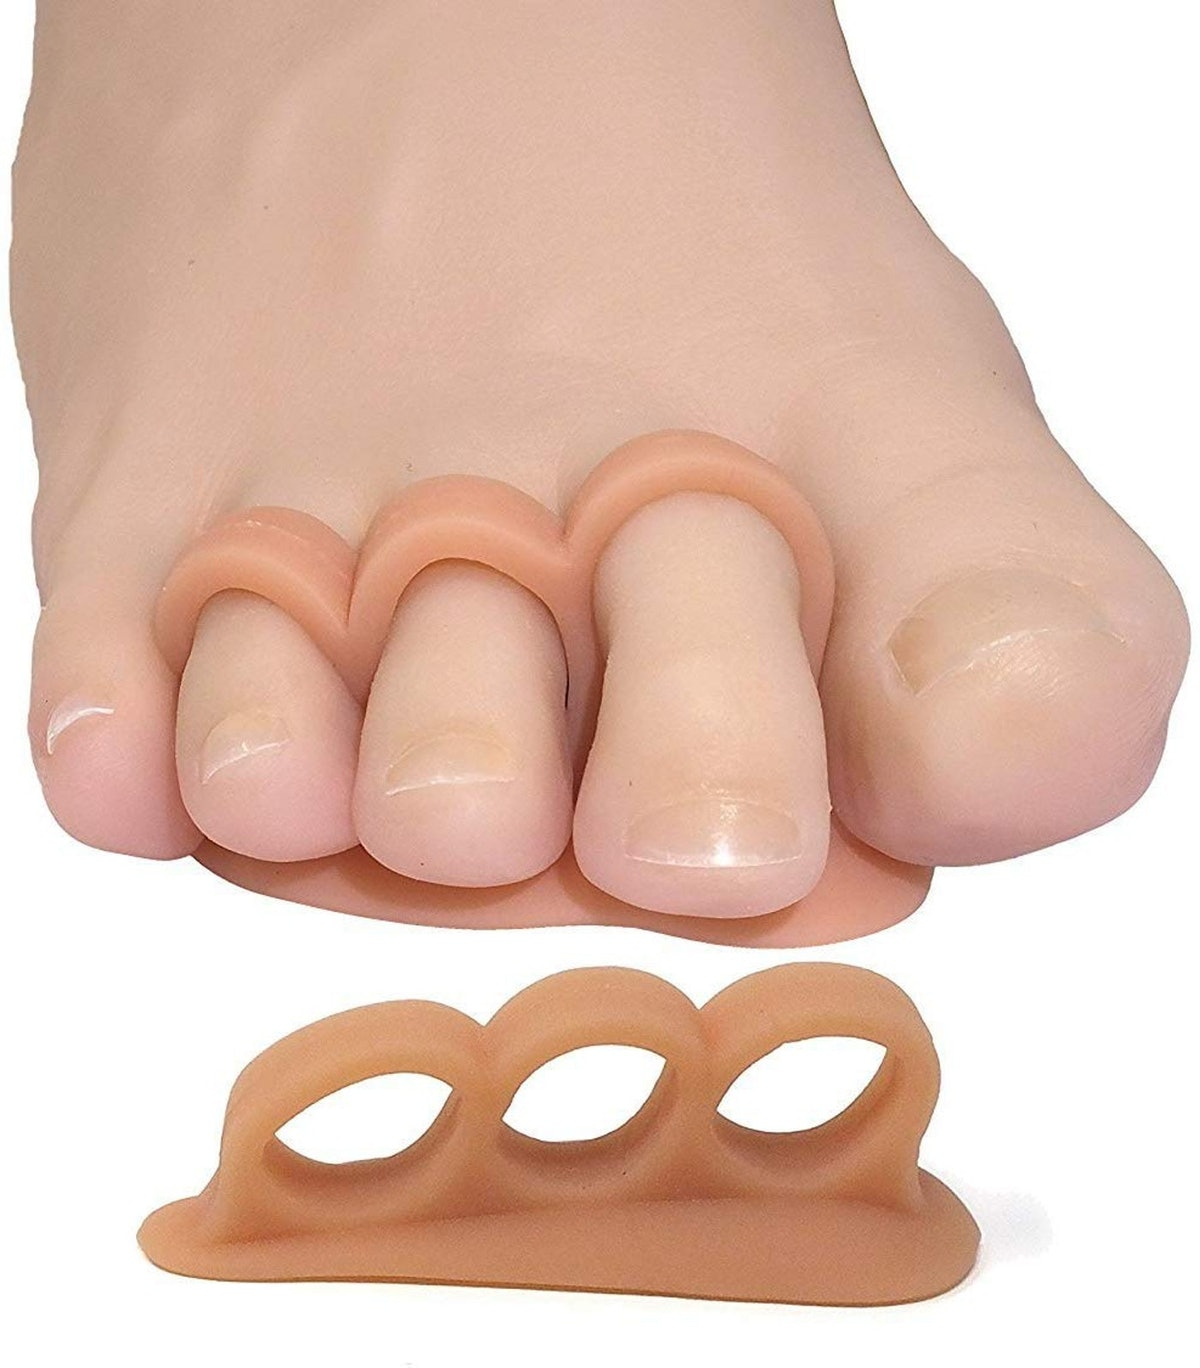 ZenToes Hammer Toe Straightener and Corrector (4-Pack)